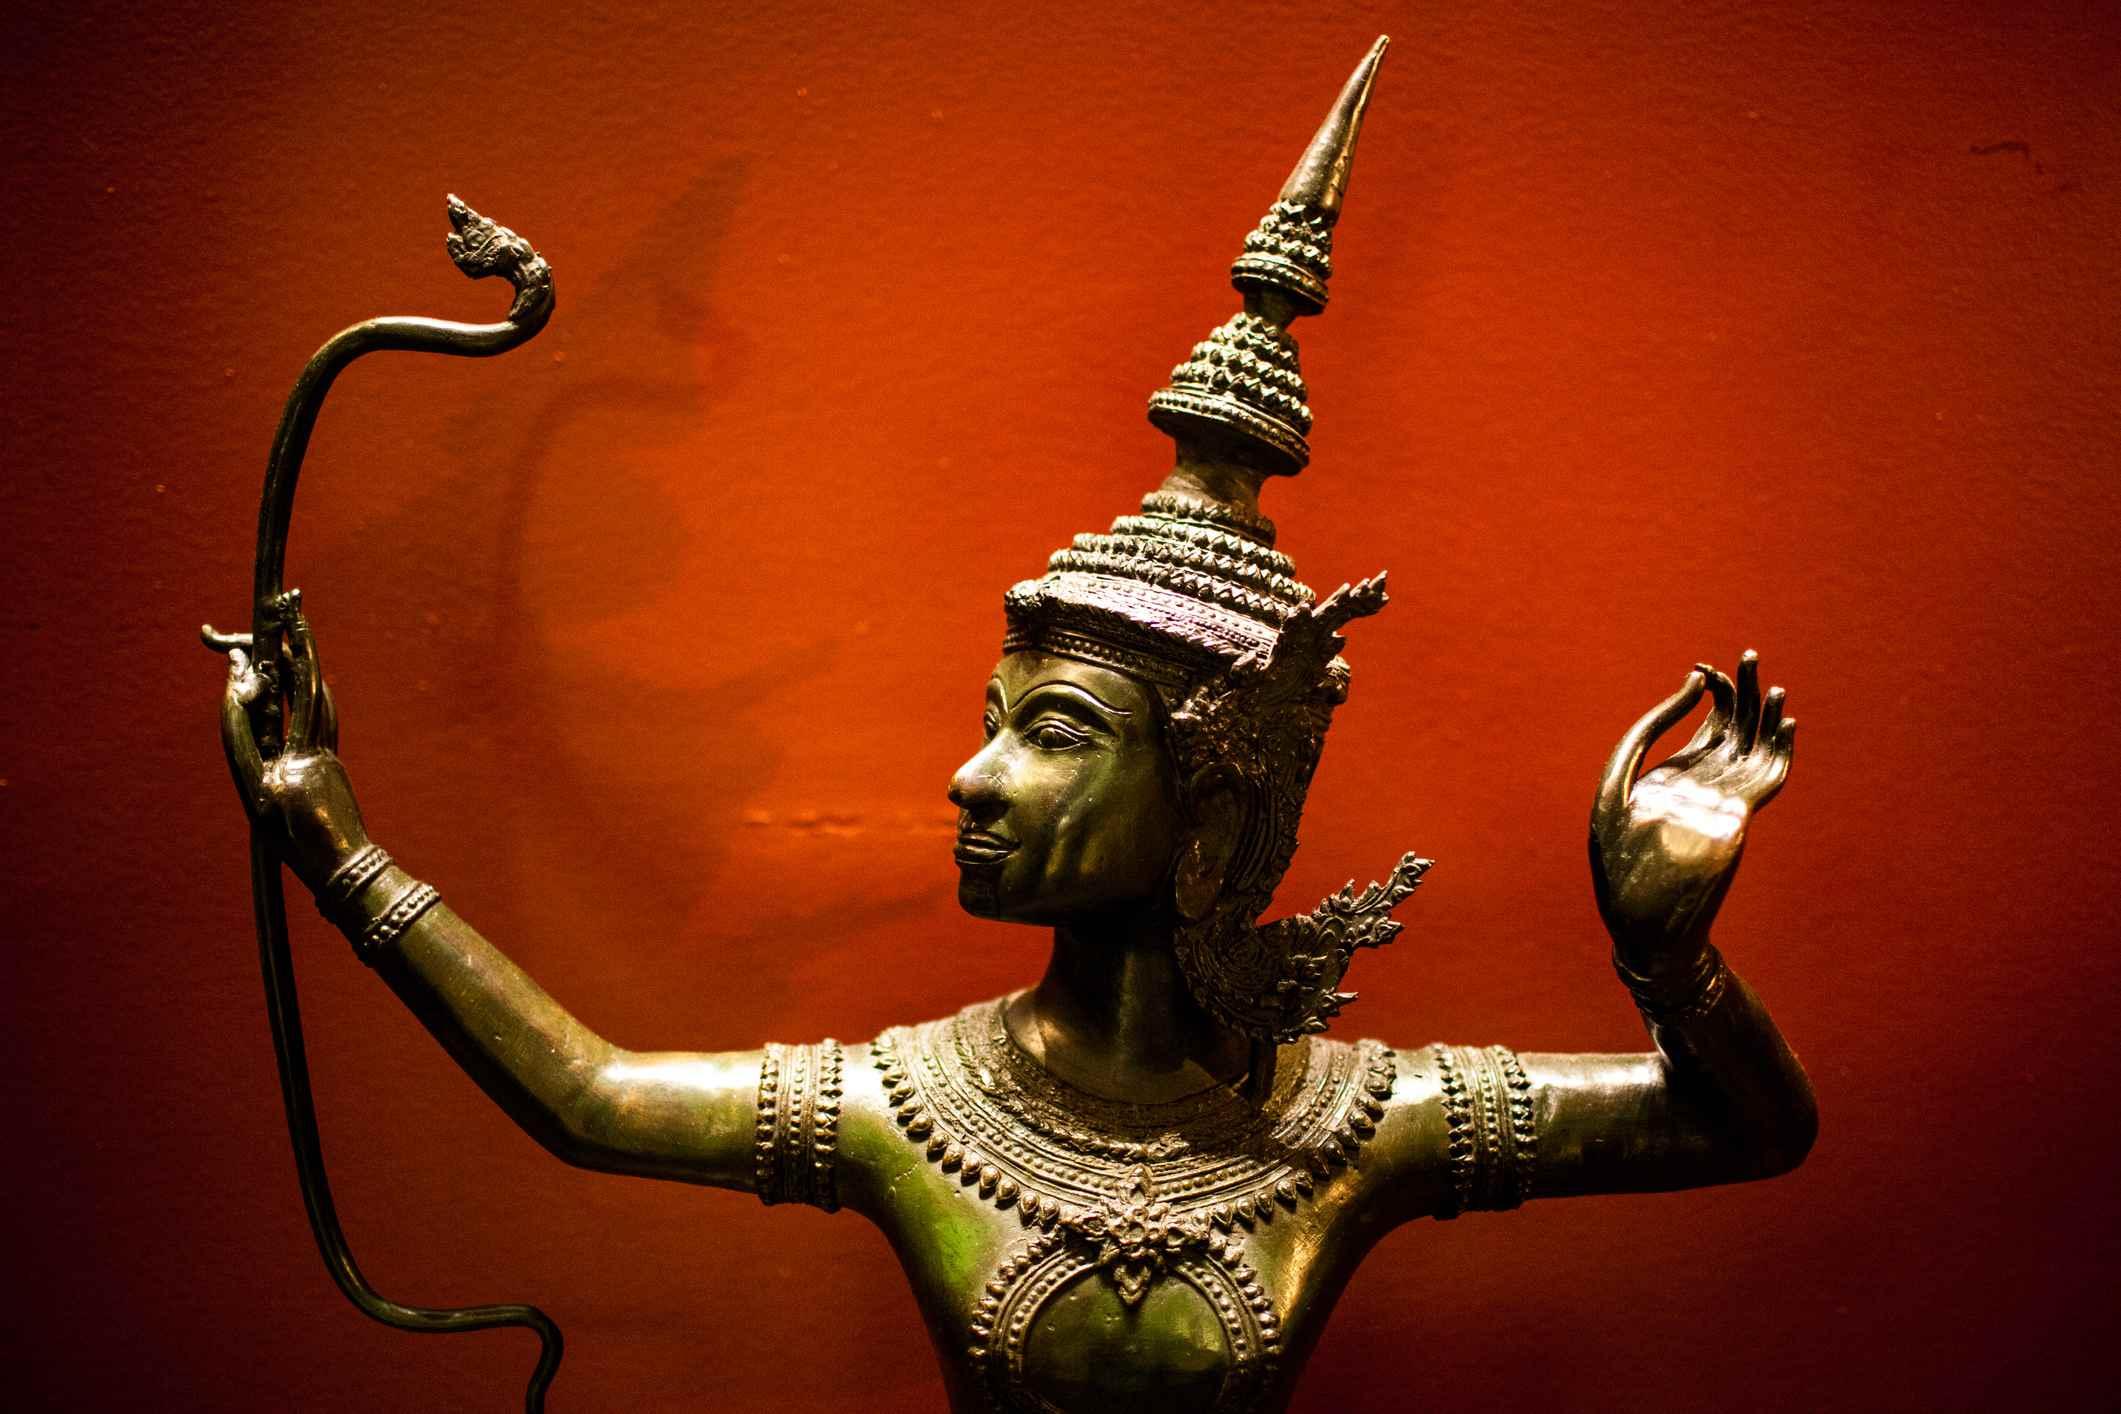 Statue depicting Lord Rama, the perfect man, an avatar of Vishnu